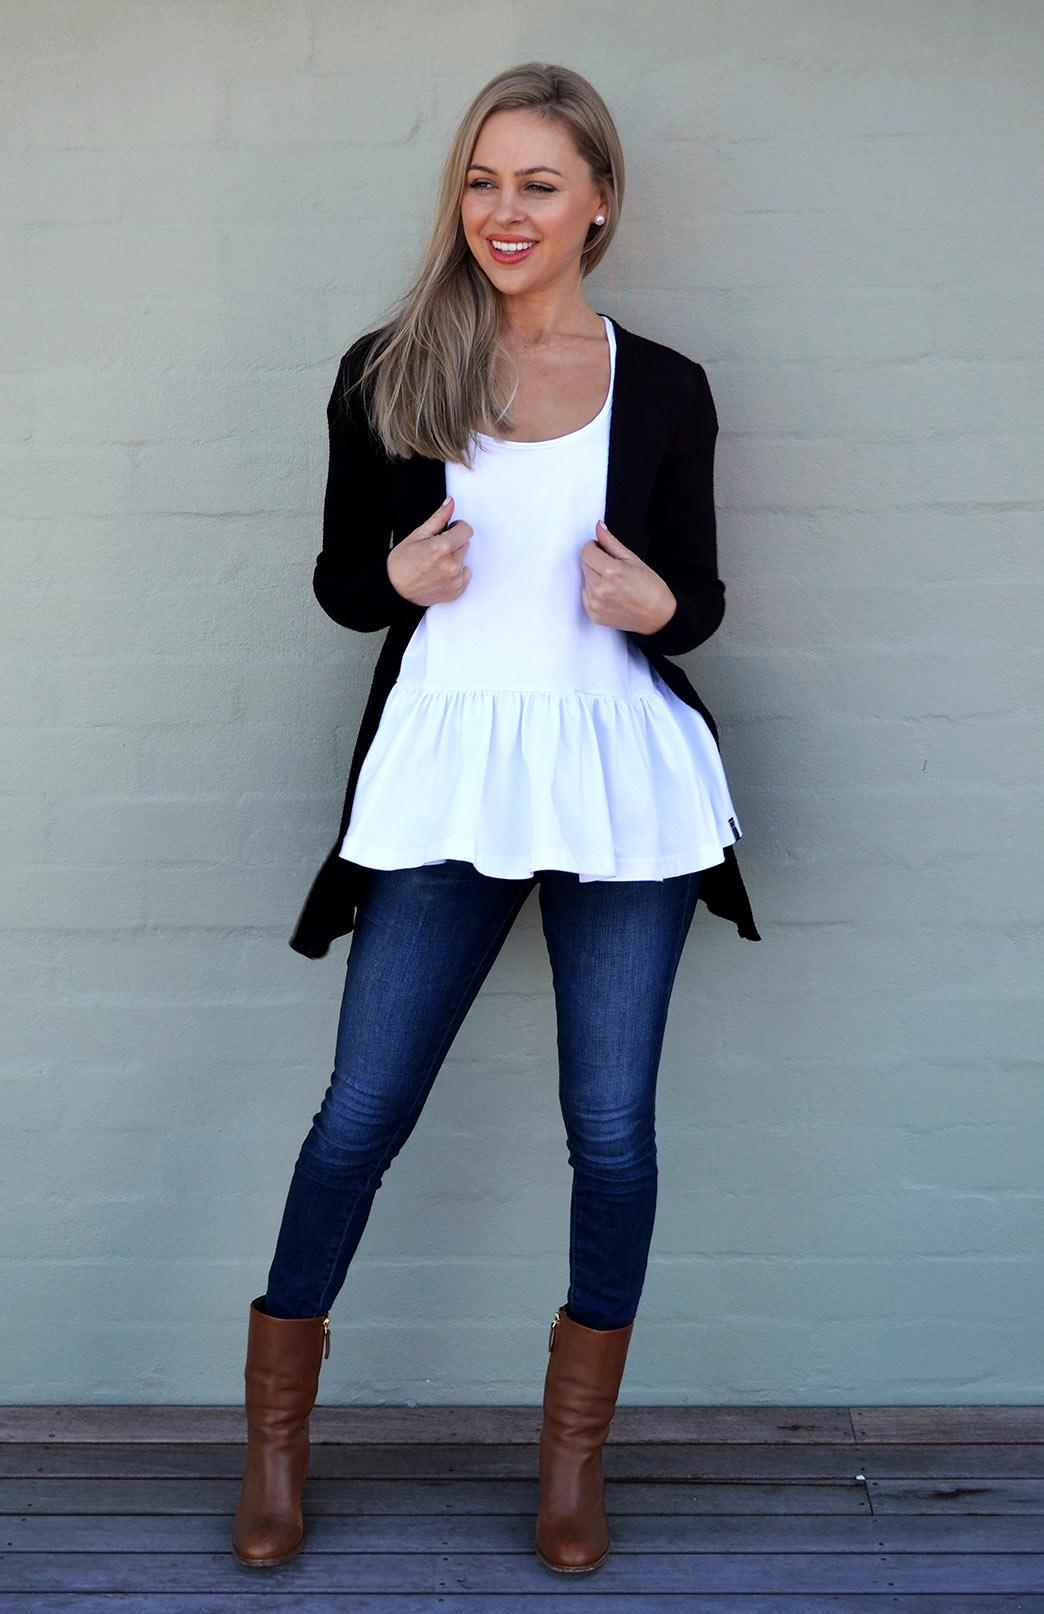 Slimline Cardigan - Women's Classic Black Long Sleeve Simple Merino Wool Cardigan - Smitten Merino Tasmania Australia